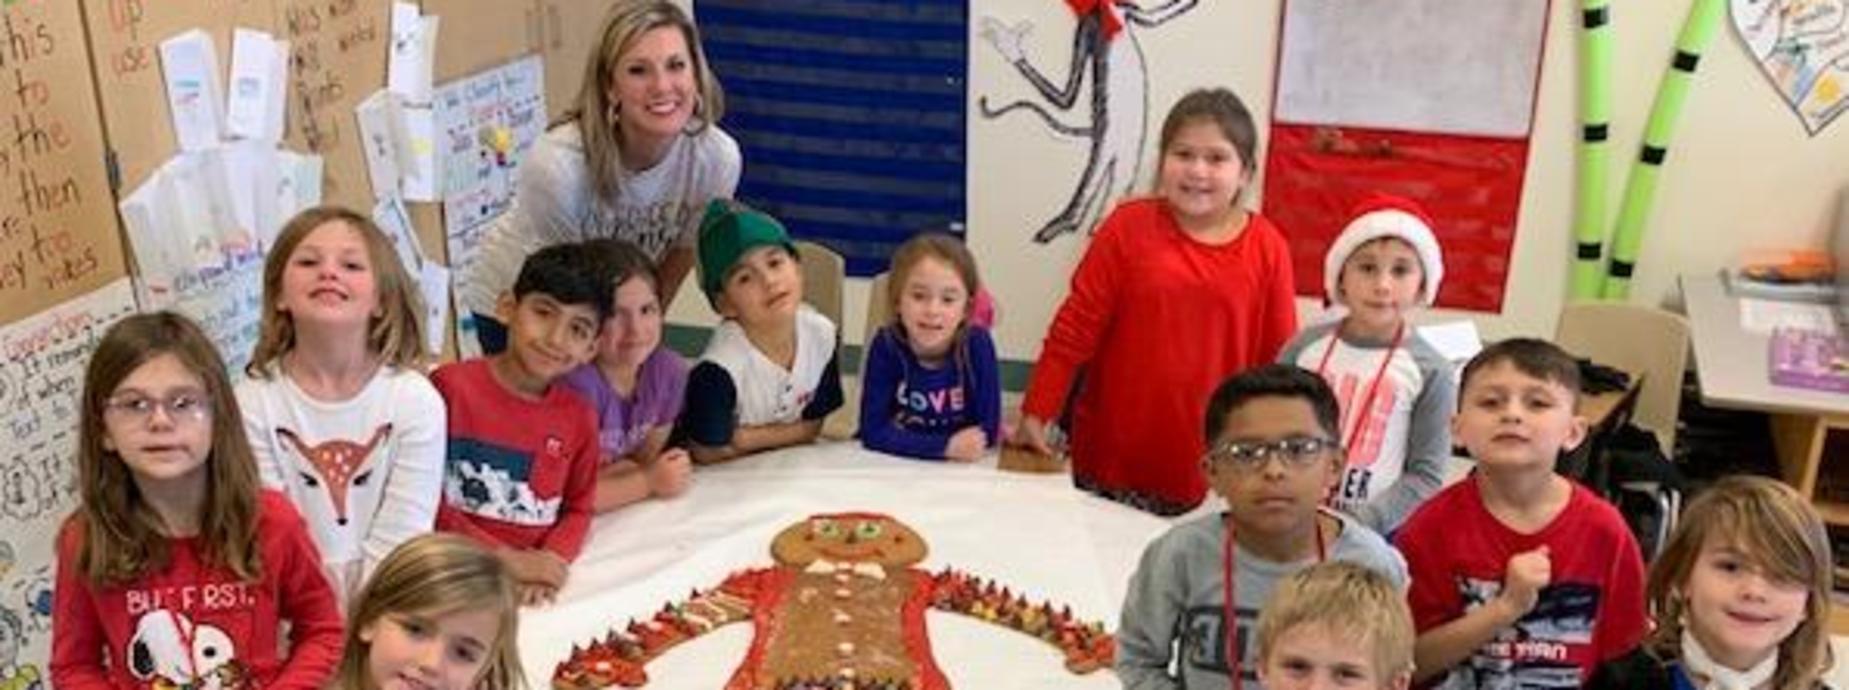 Mrs. Borgfeld's Class made a life size Gingerbread man!